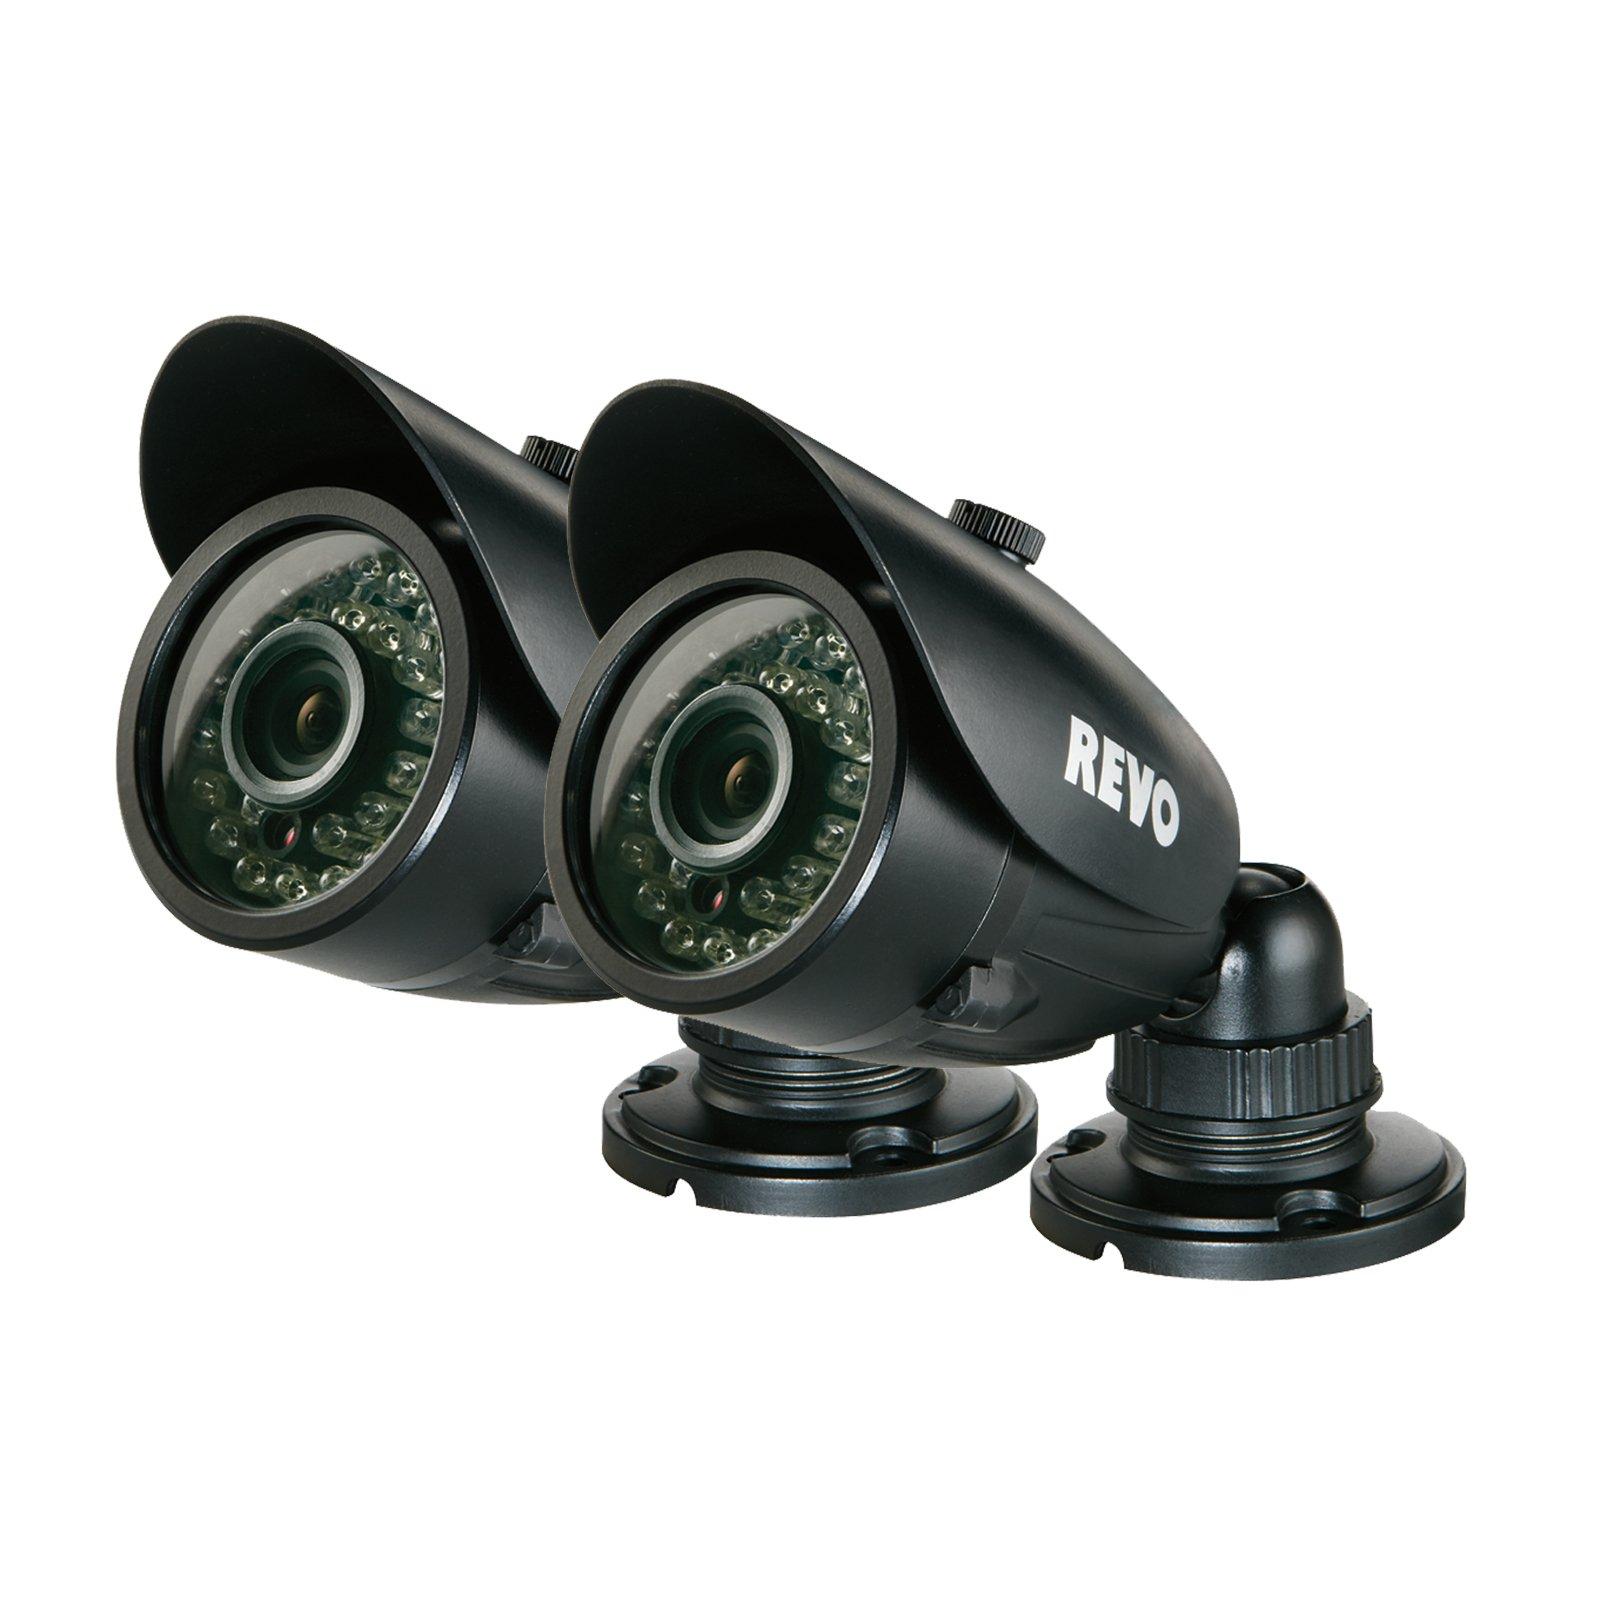 REVO America RCBS30-3BNDL2 Indoor/Outdoor Bullet Surveillance Camera with Night Vision (Black), 2-Pack